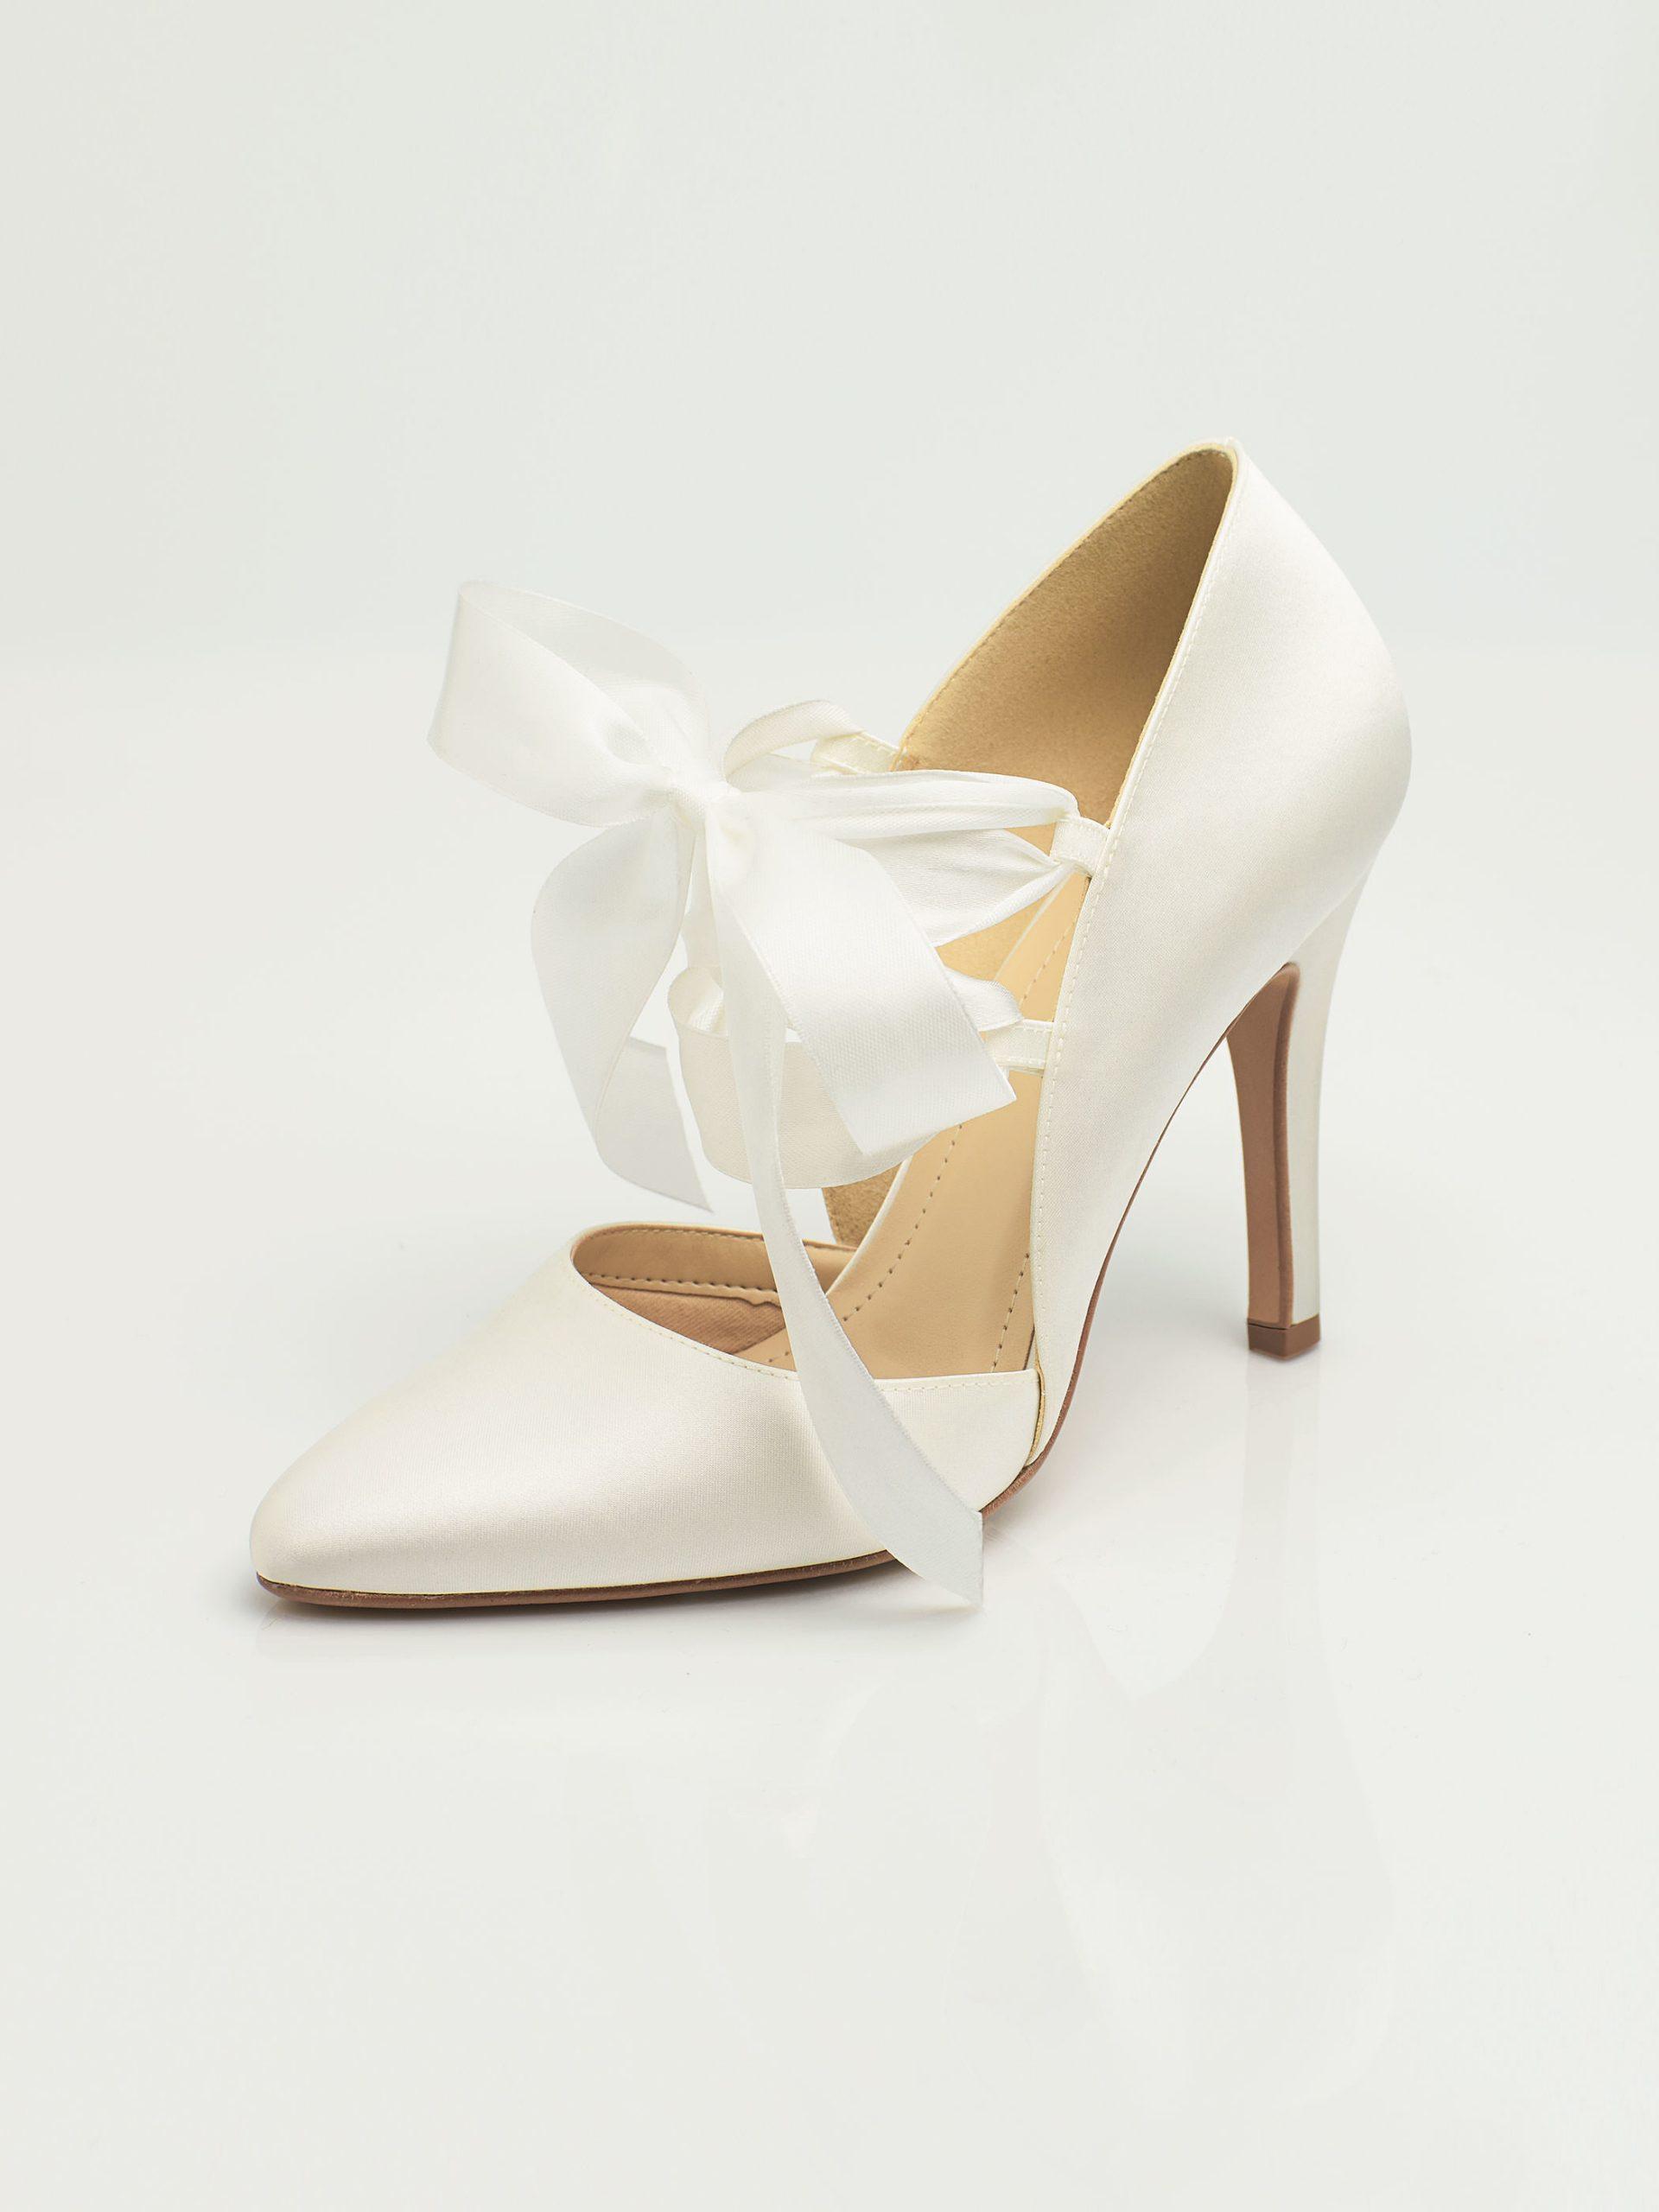 Les chaussures Gigi